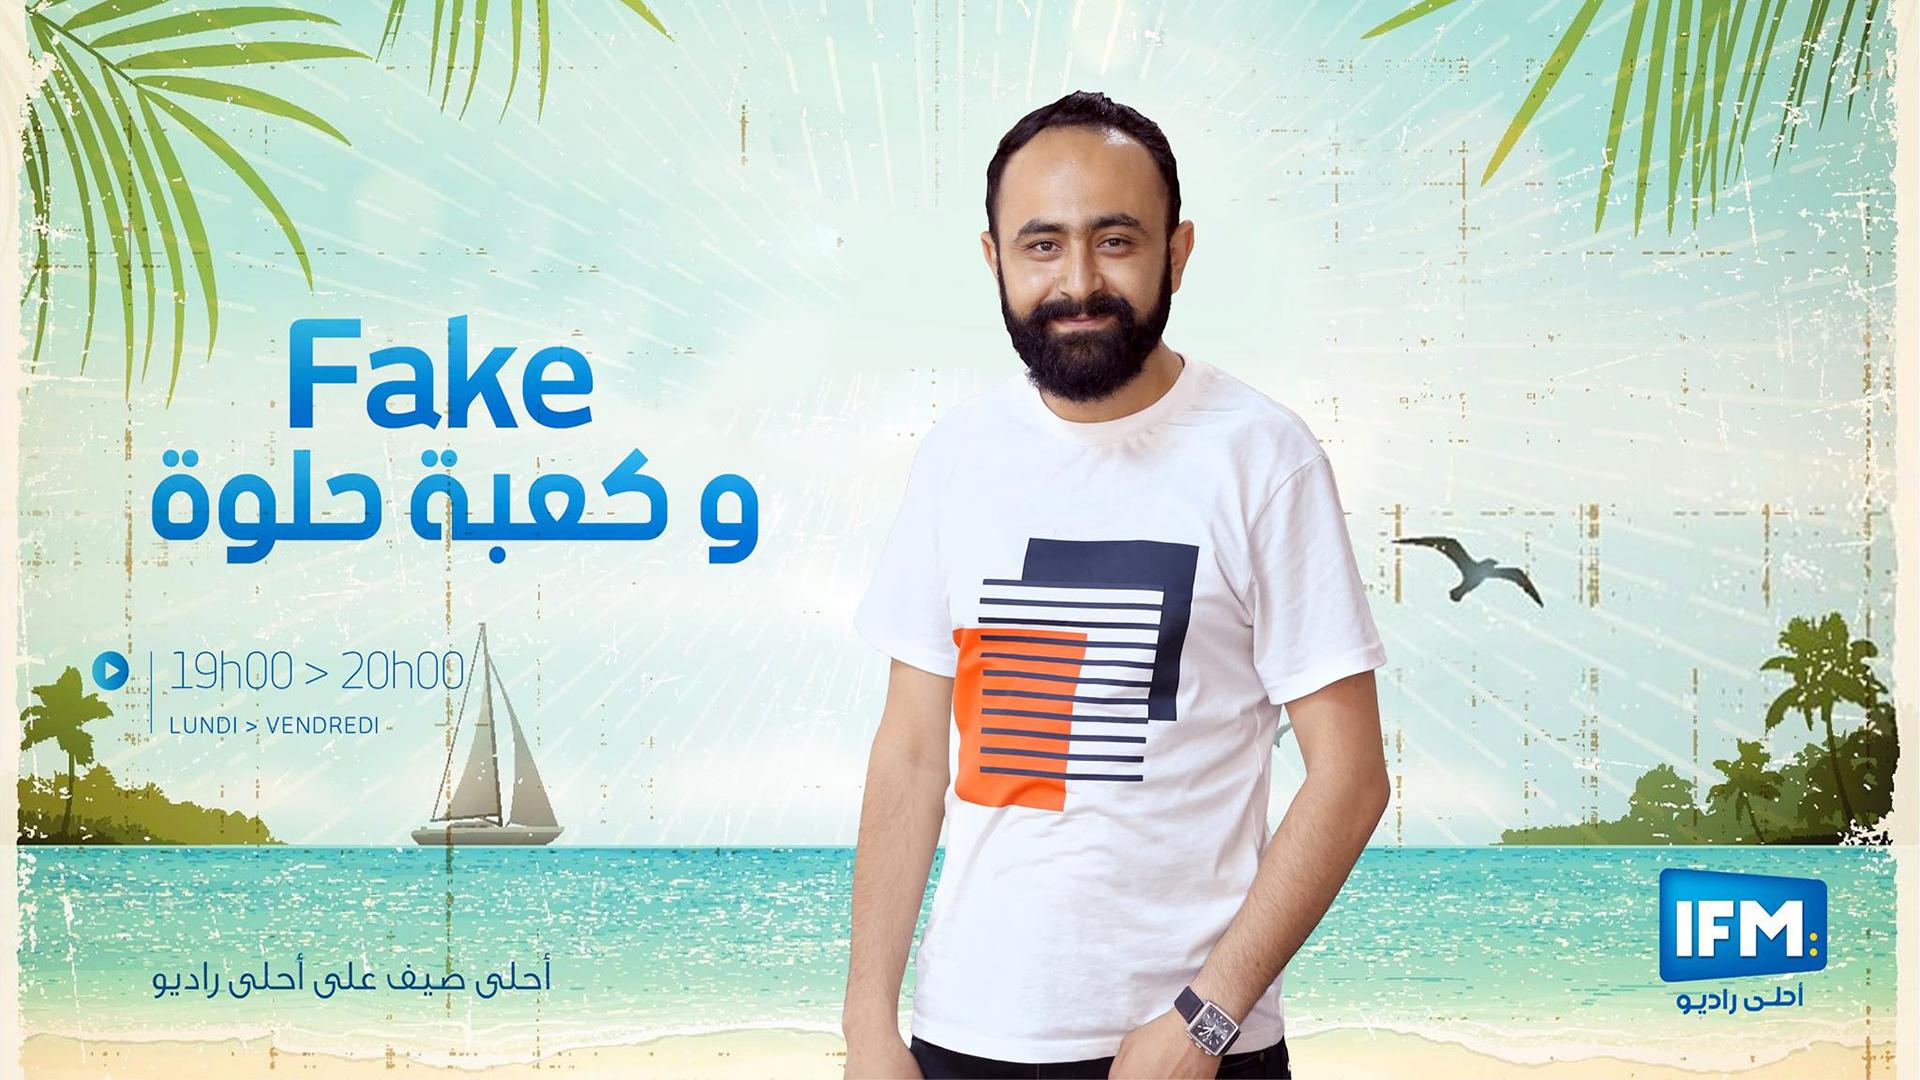 Fake w ka3ba 7alwa du vendredi 03 Juillet 2020